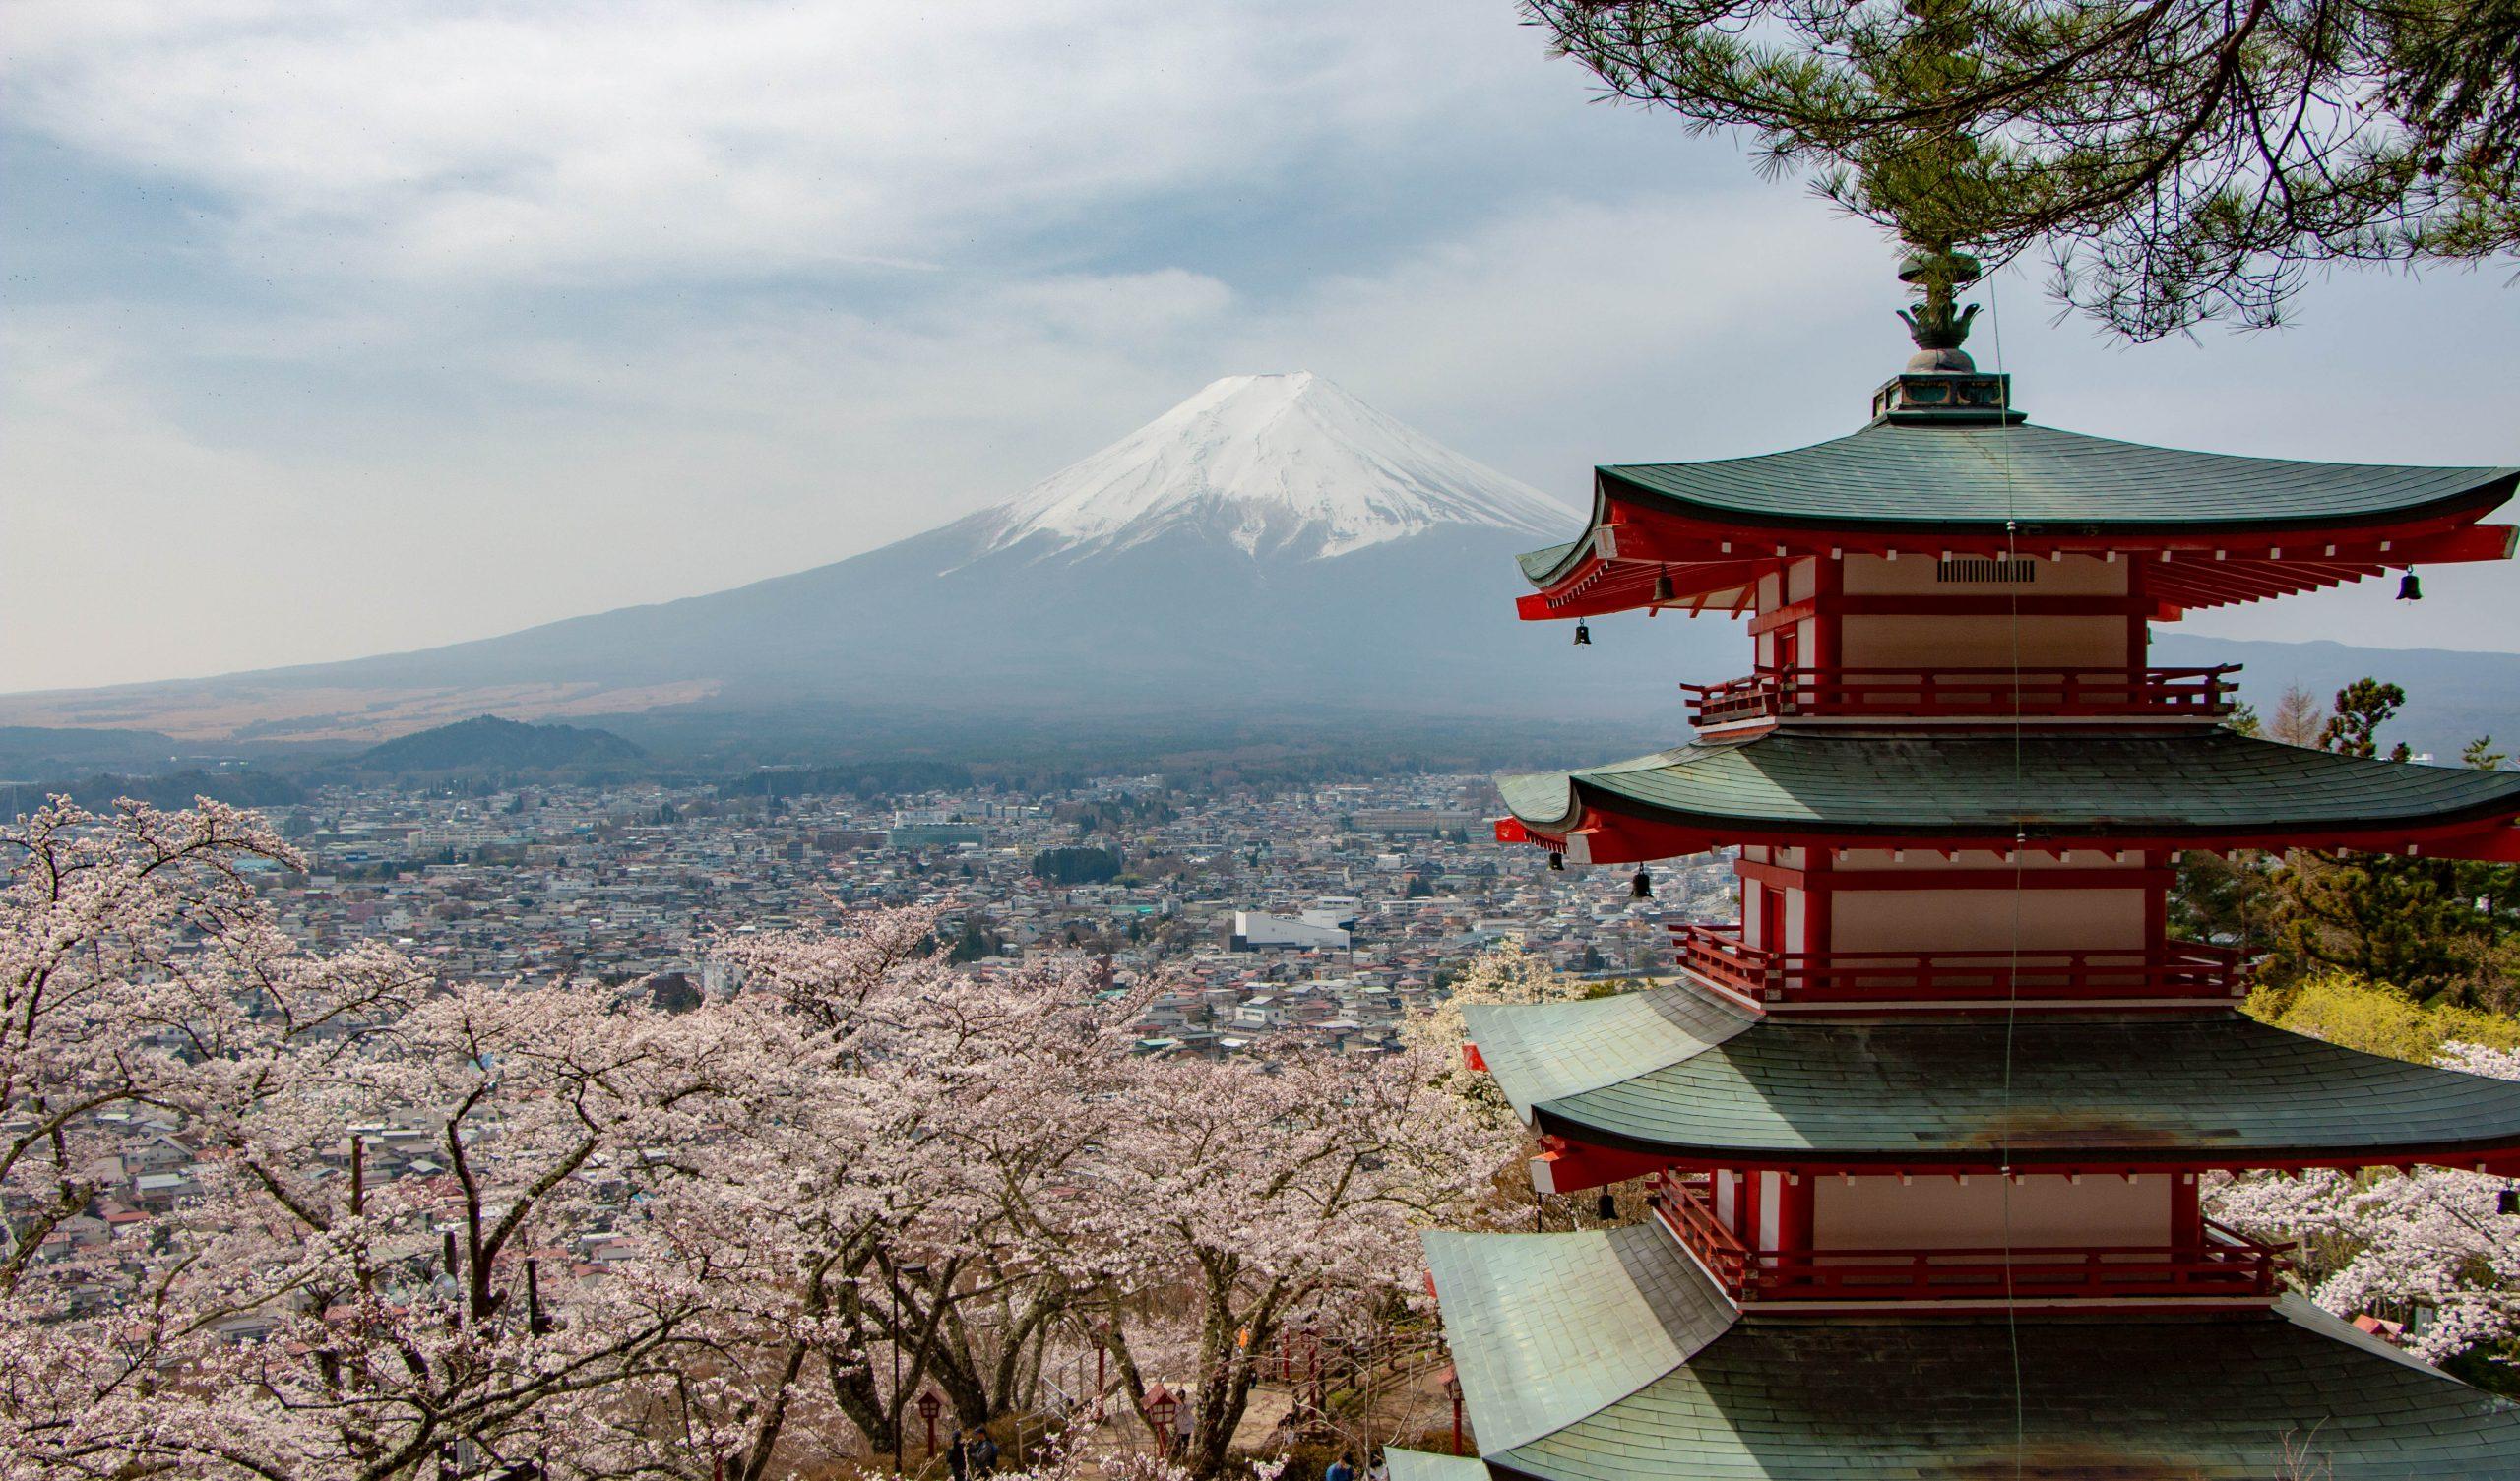 Viewing Mount Fuji from Fujiyoshida